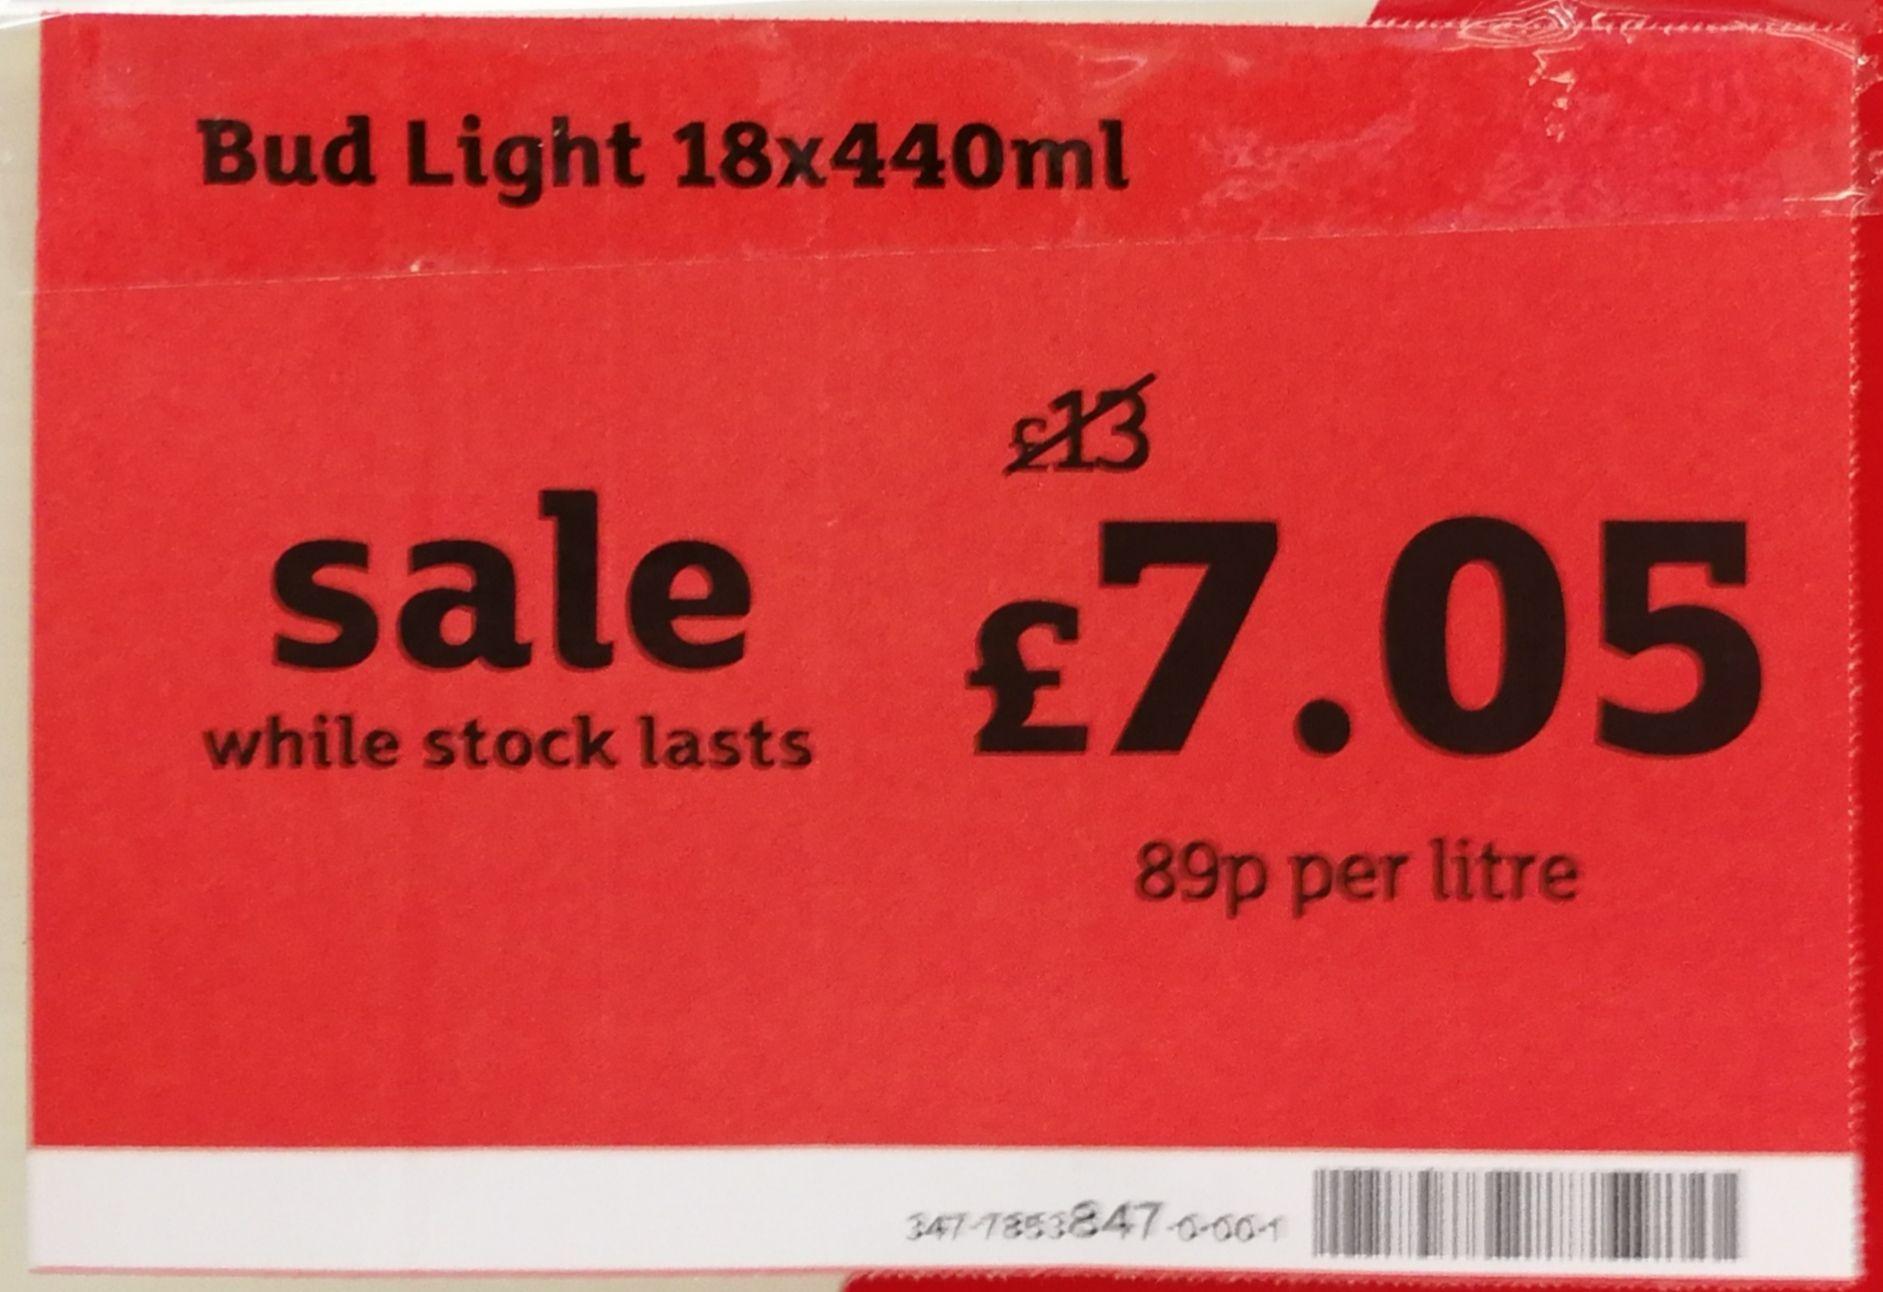 18 X 440ml Bud Light for £7.05 @ Sainsbury's Trowbridge